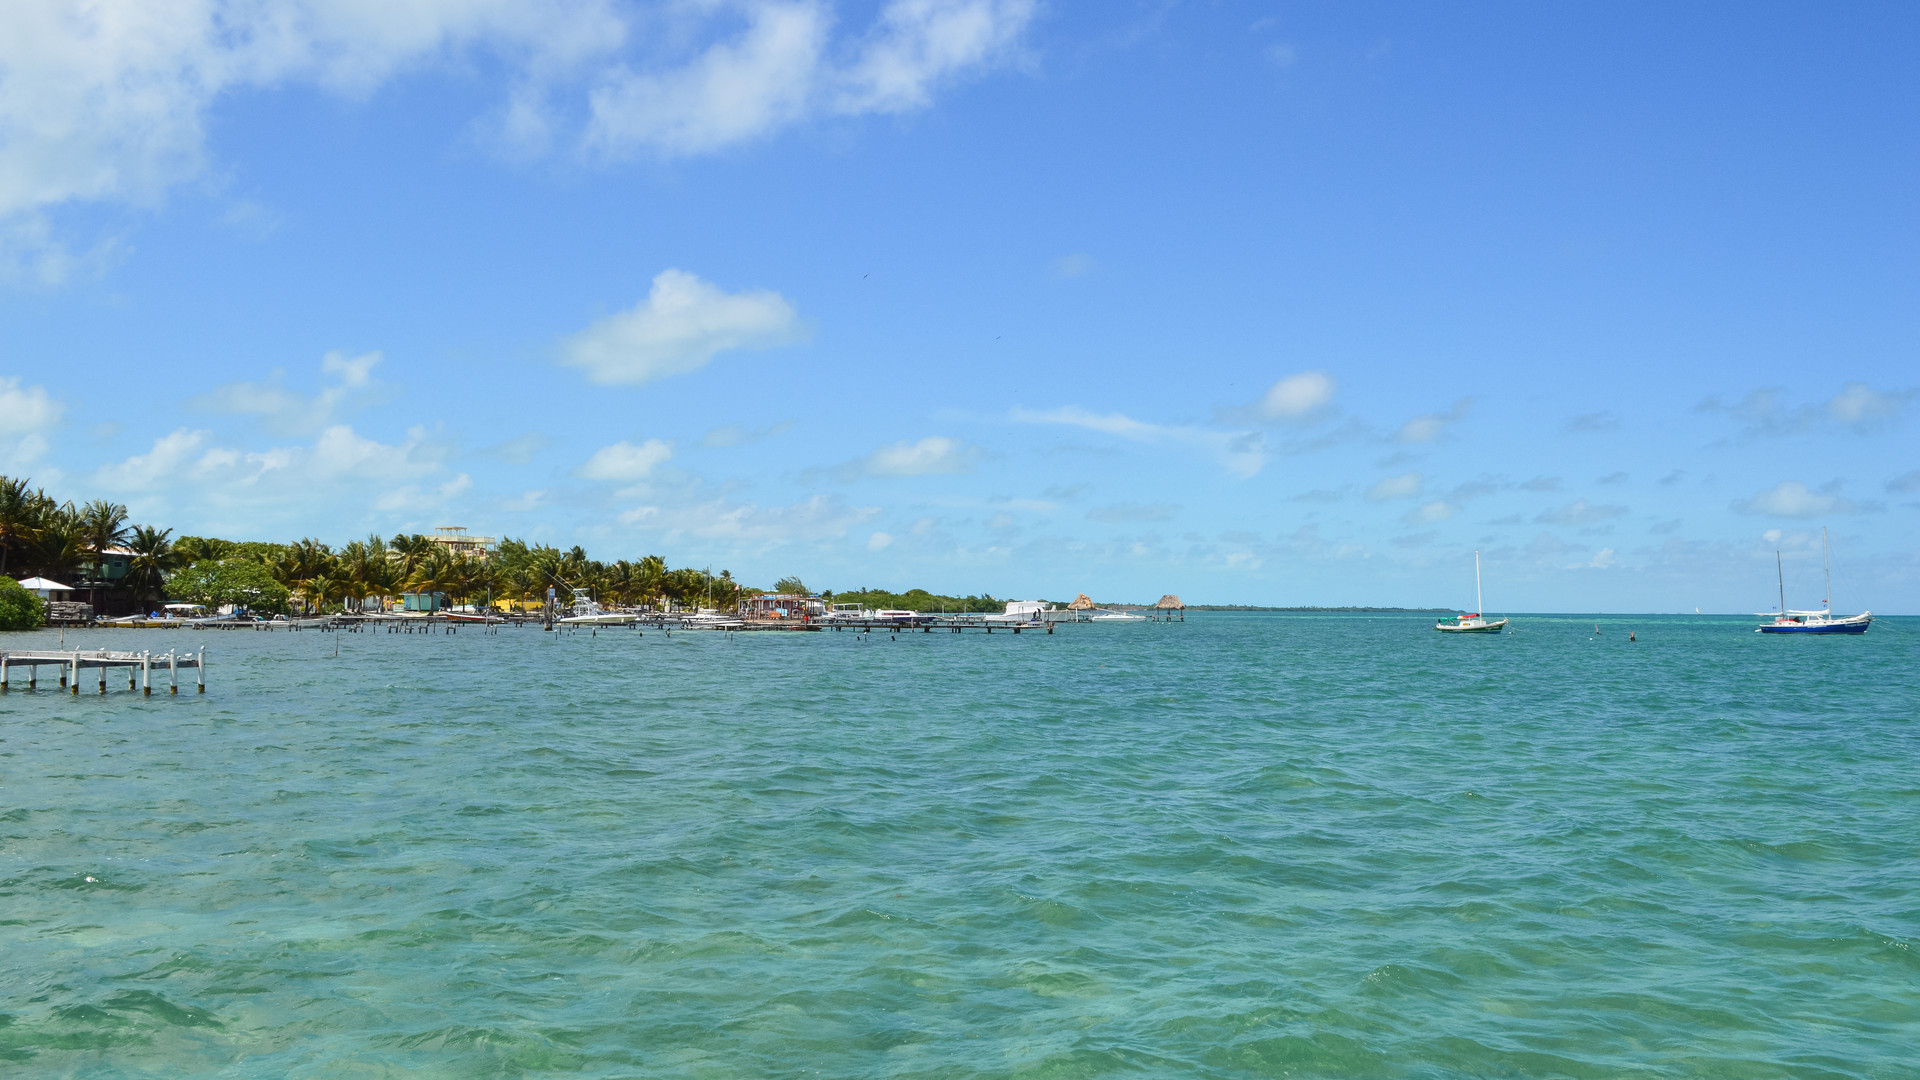 Oceanfront, Caye Caulker / Belize · 2014